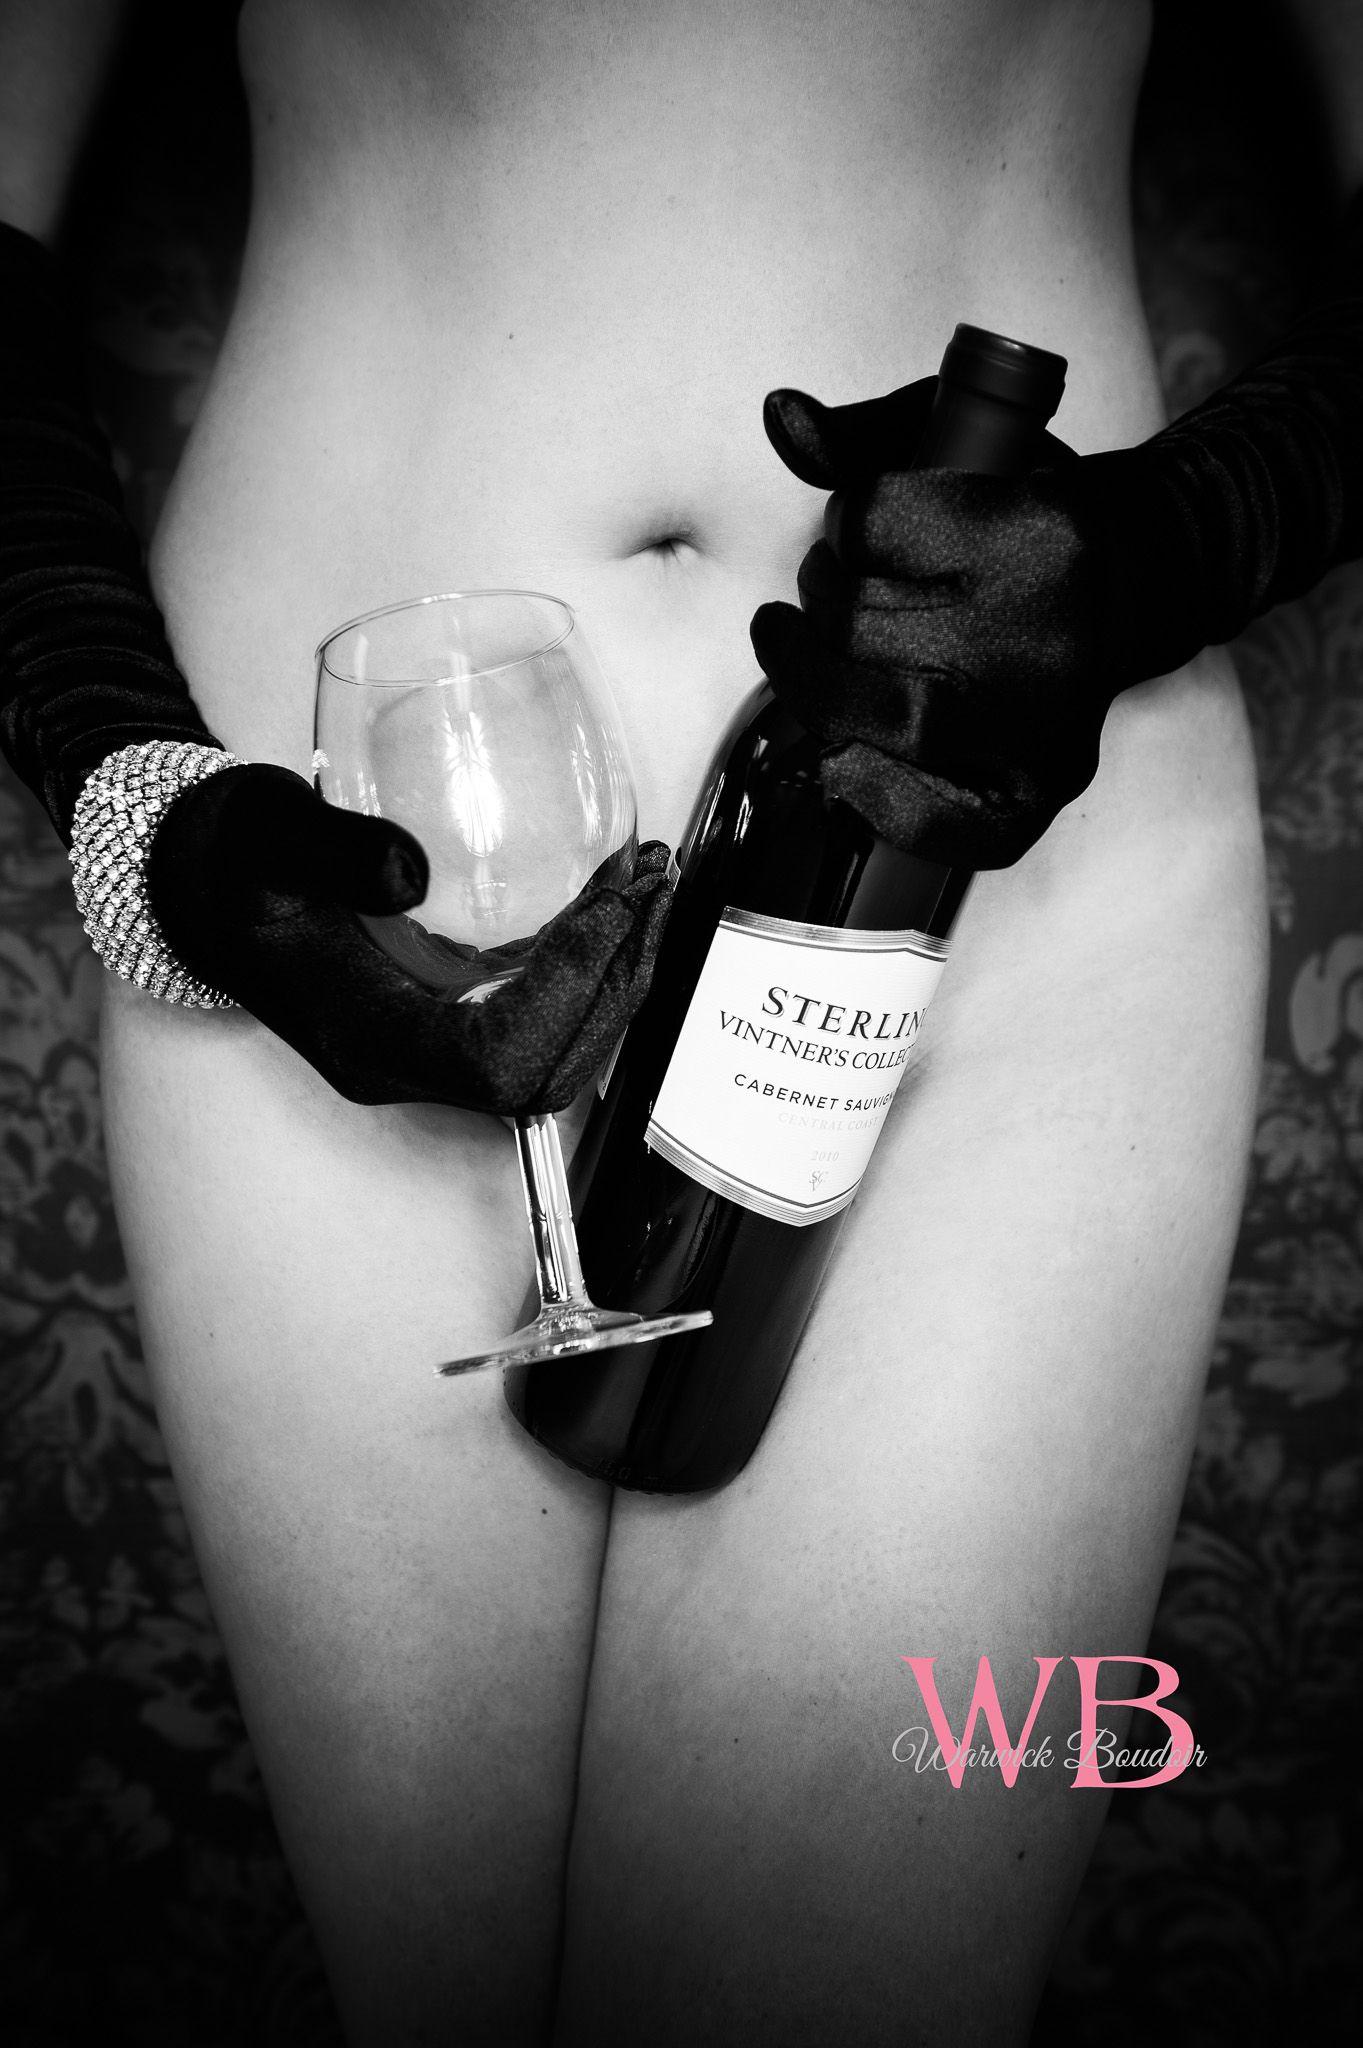 Final, sorry, Women wine bottle nude right! think